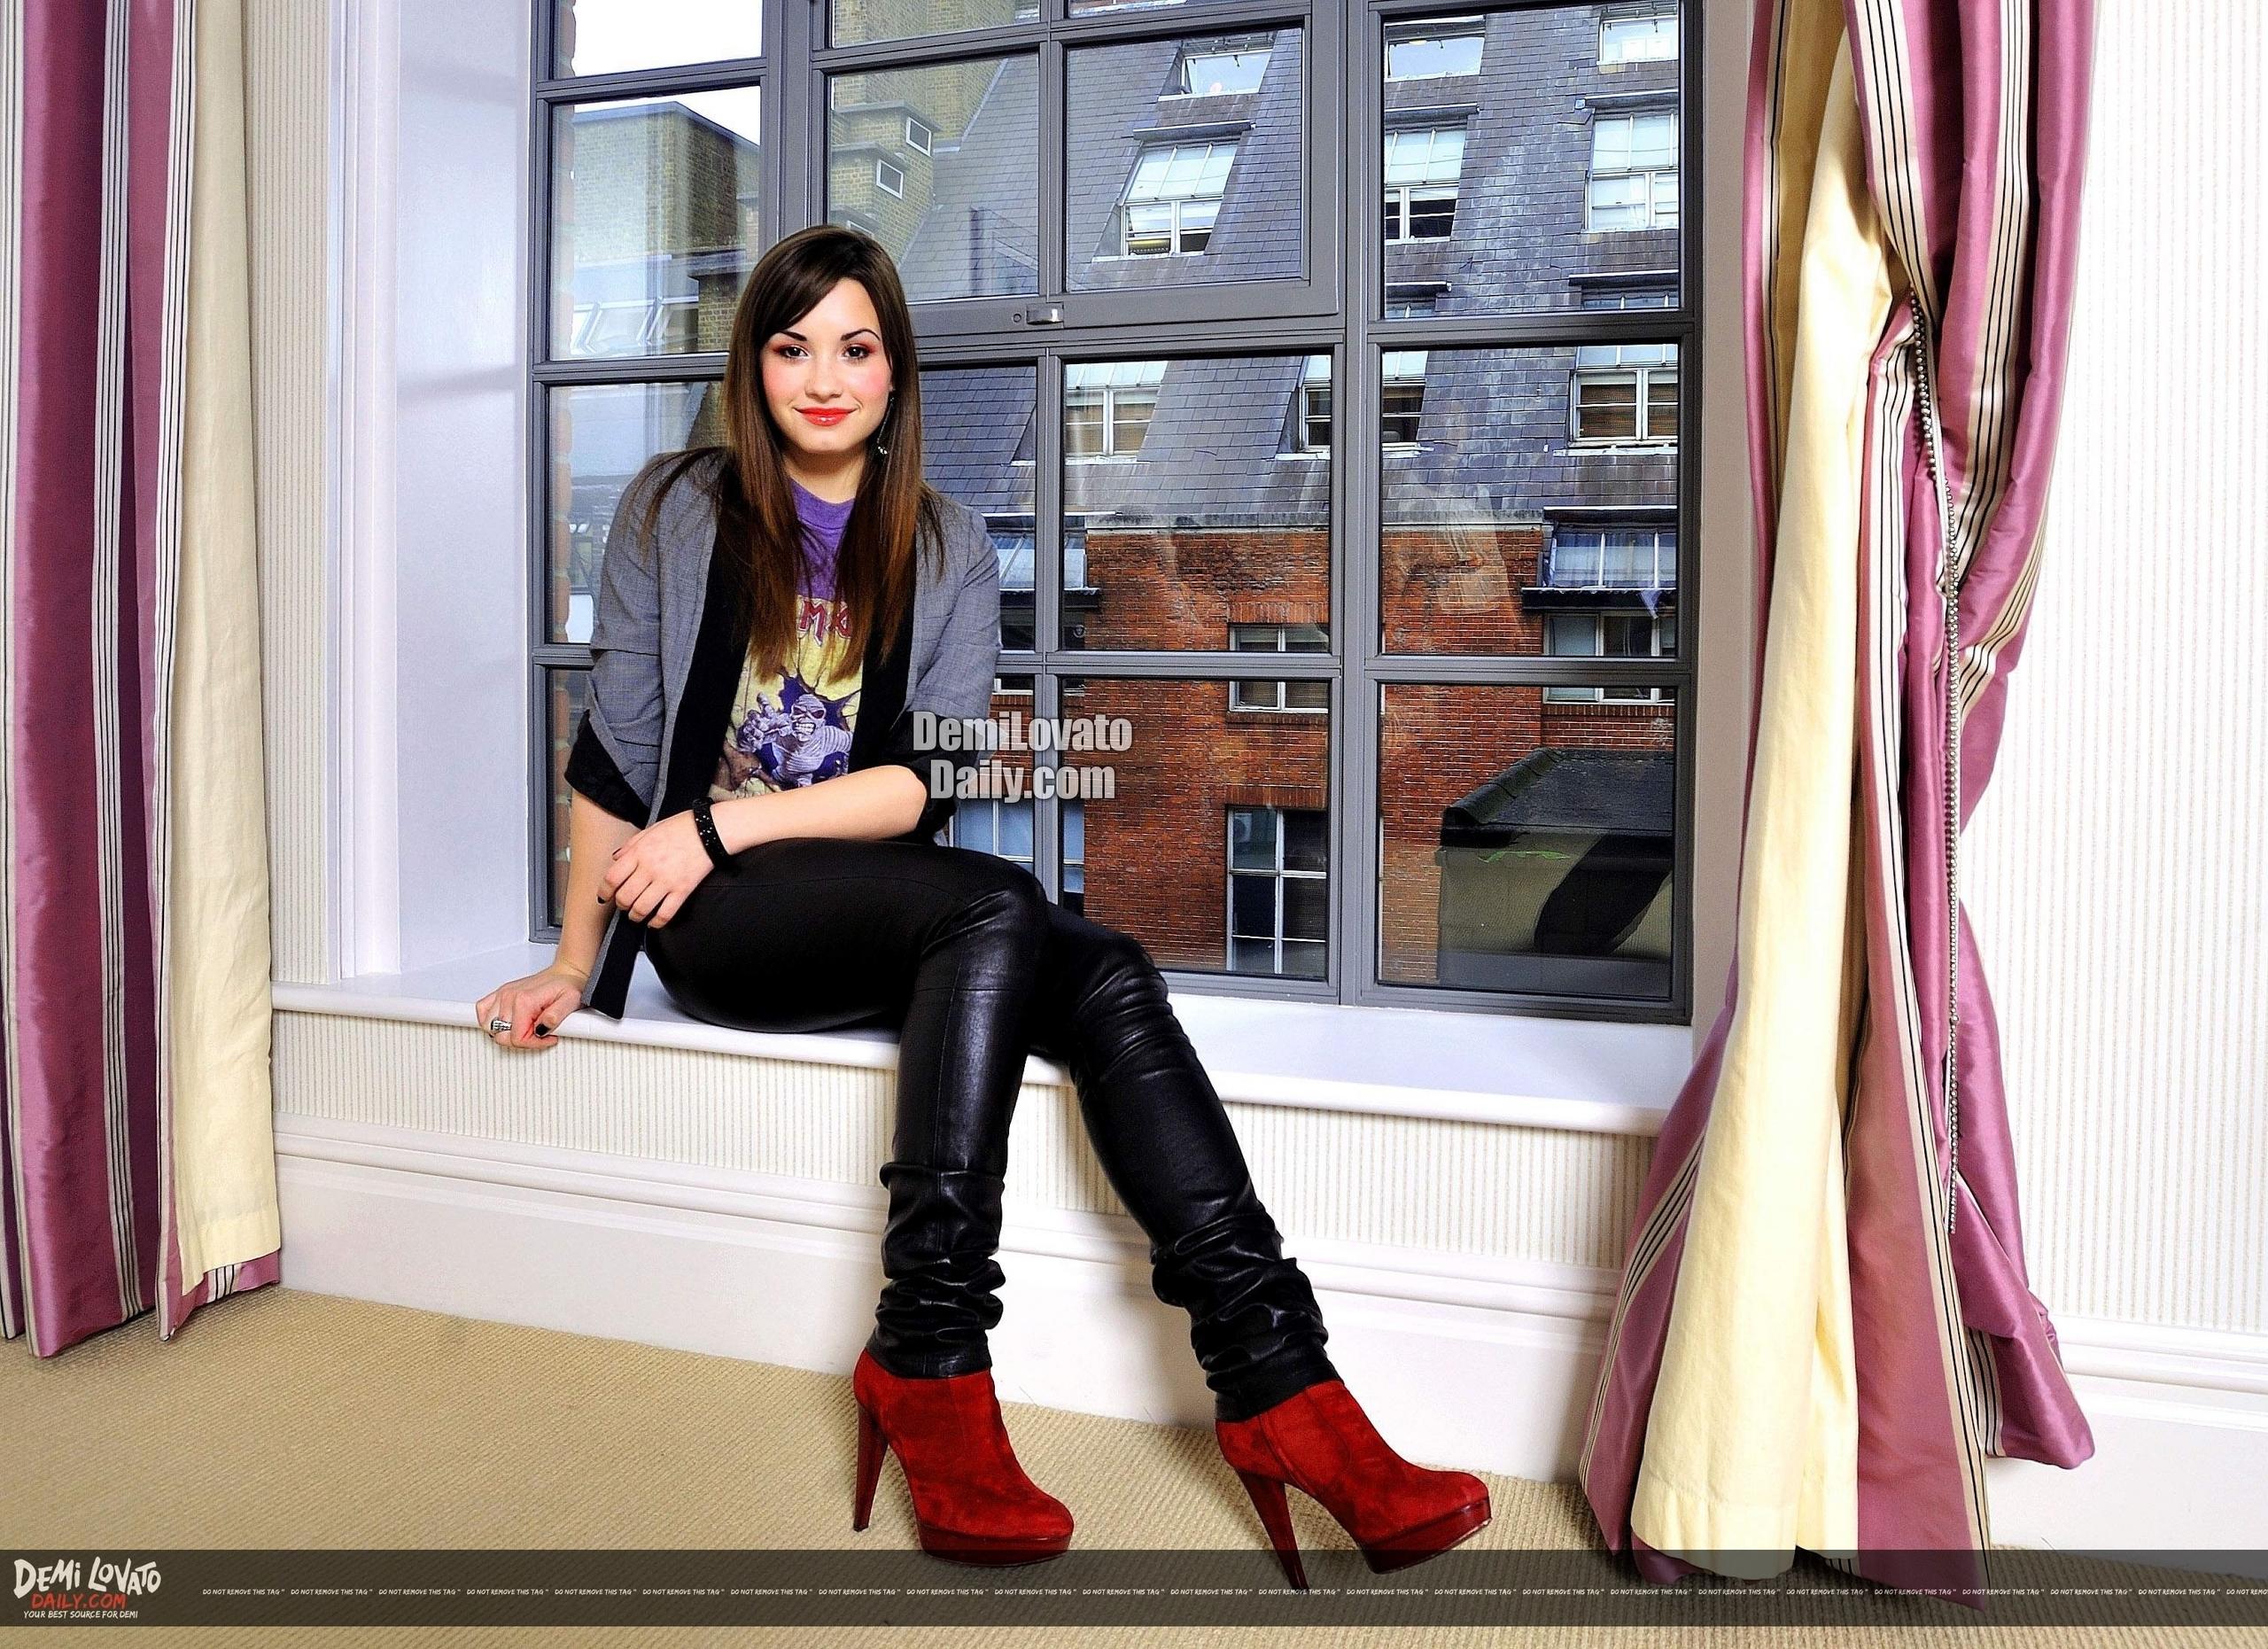 Demi Lovato D Mirror 2008 Photoshoot Anichu90 Photo